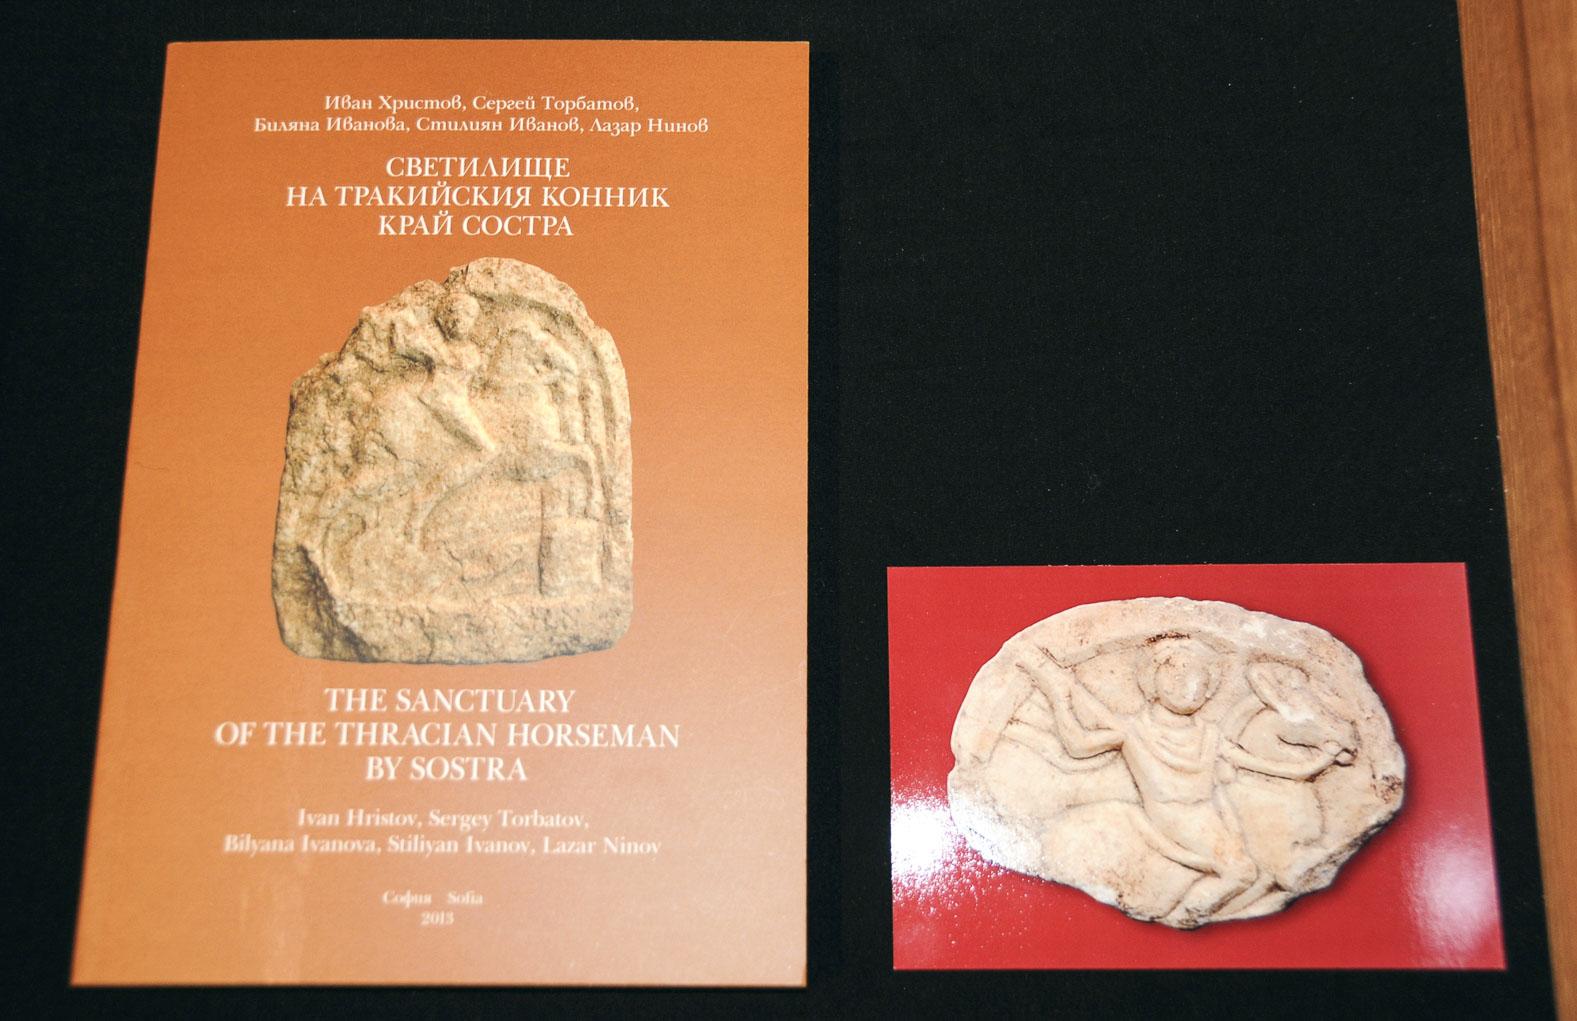 troyan-museum-jivotat-na-edna-idea-17